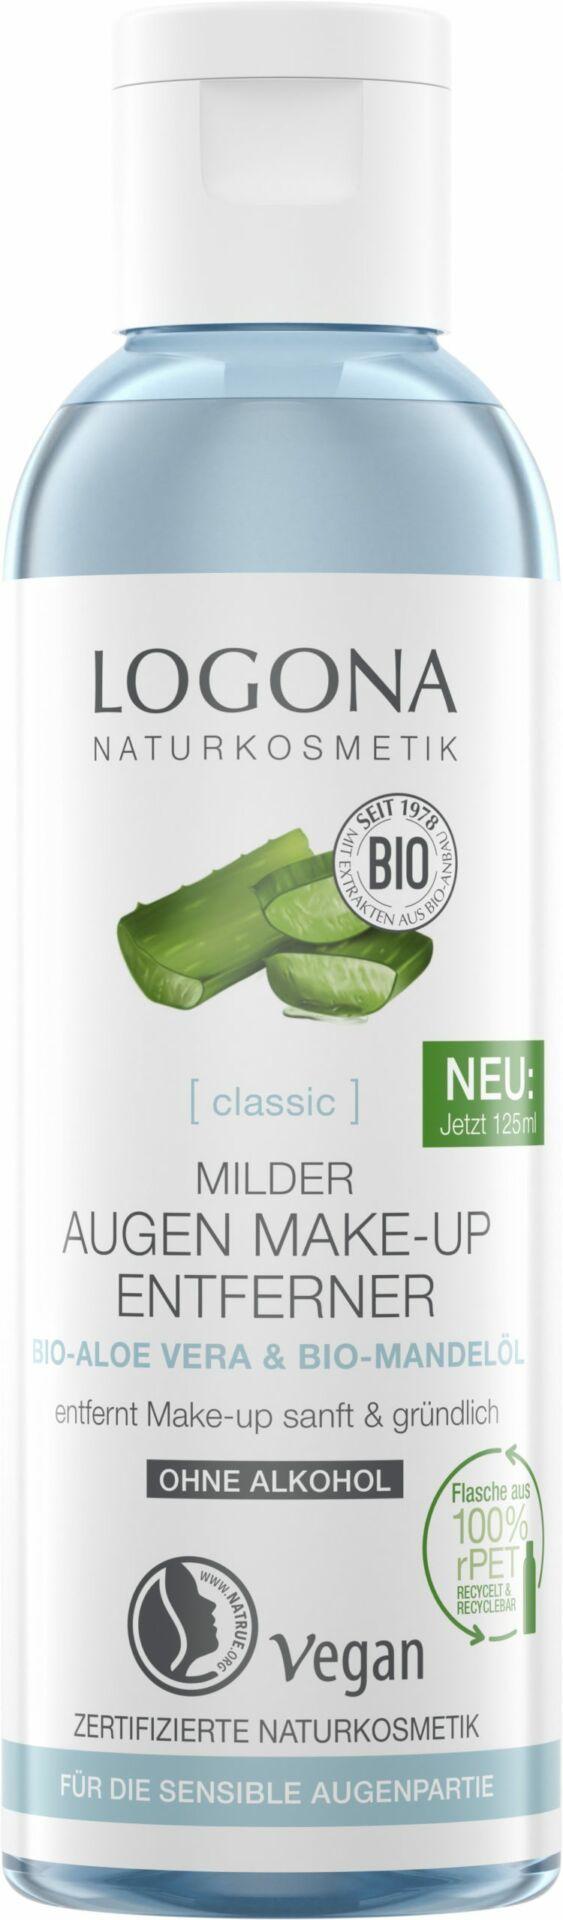 Logona CLASSIC Milder Augen Make-up Entferner Bio-Aloe Vera 125ml